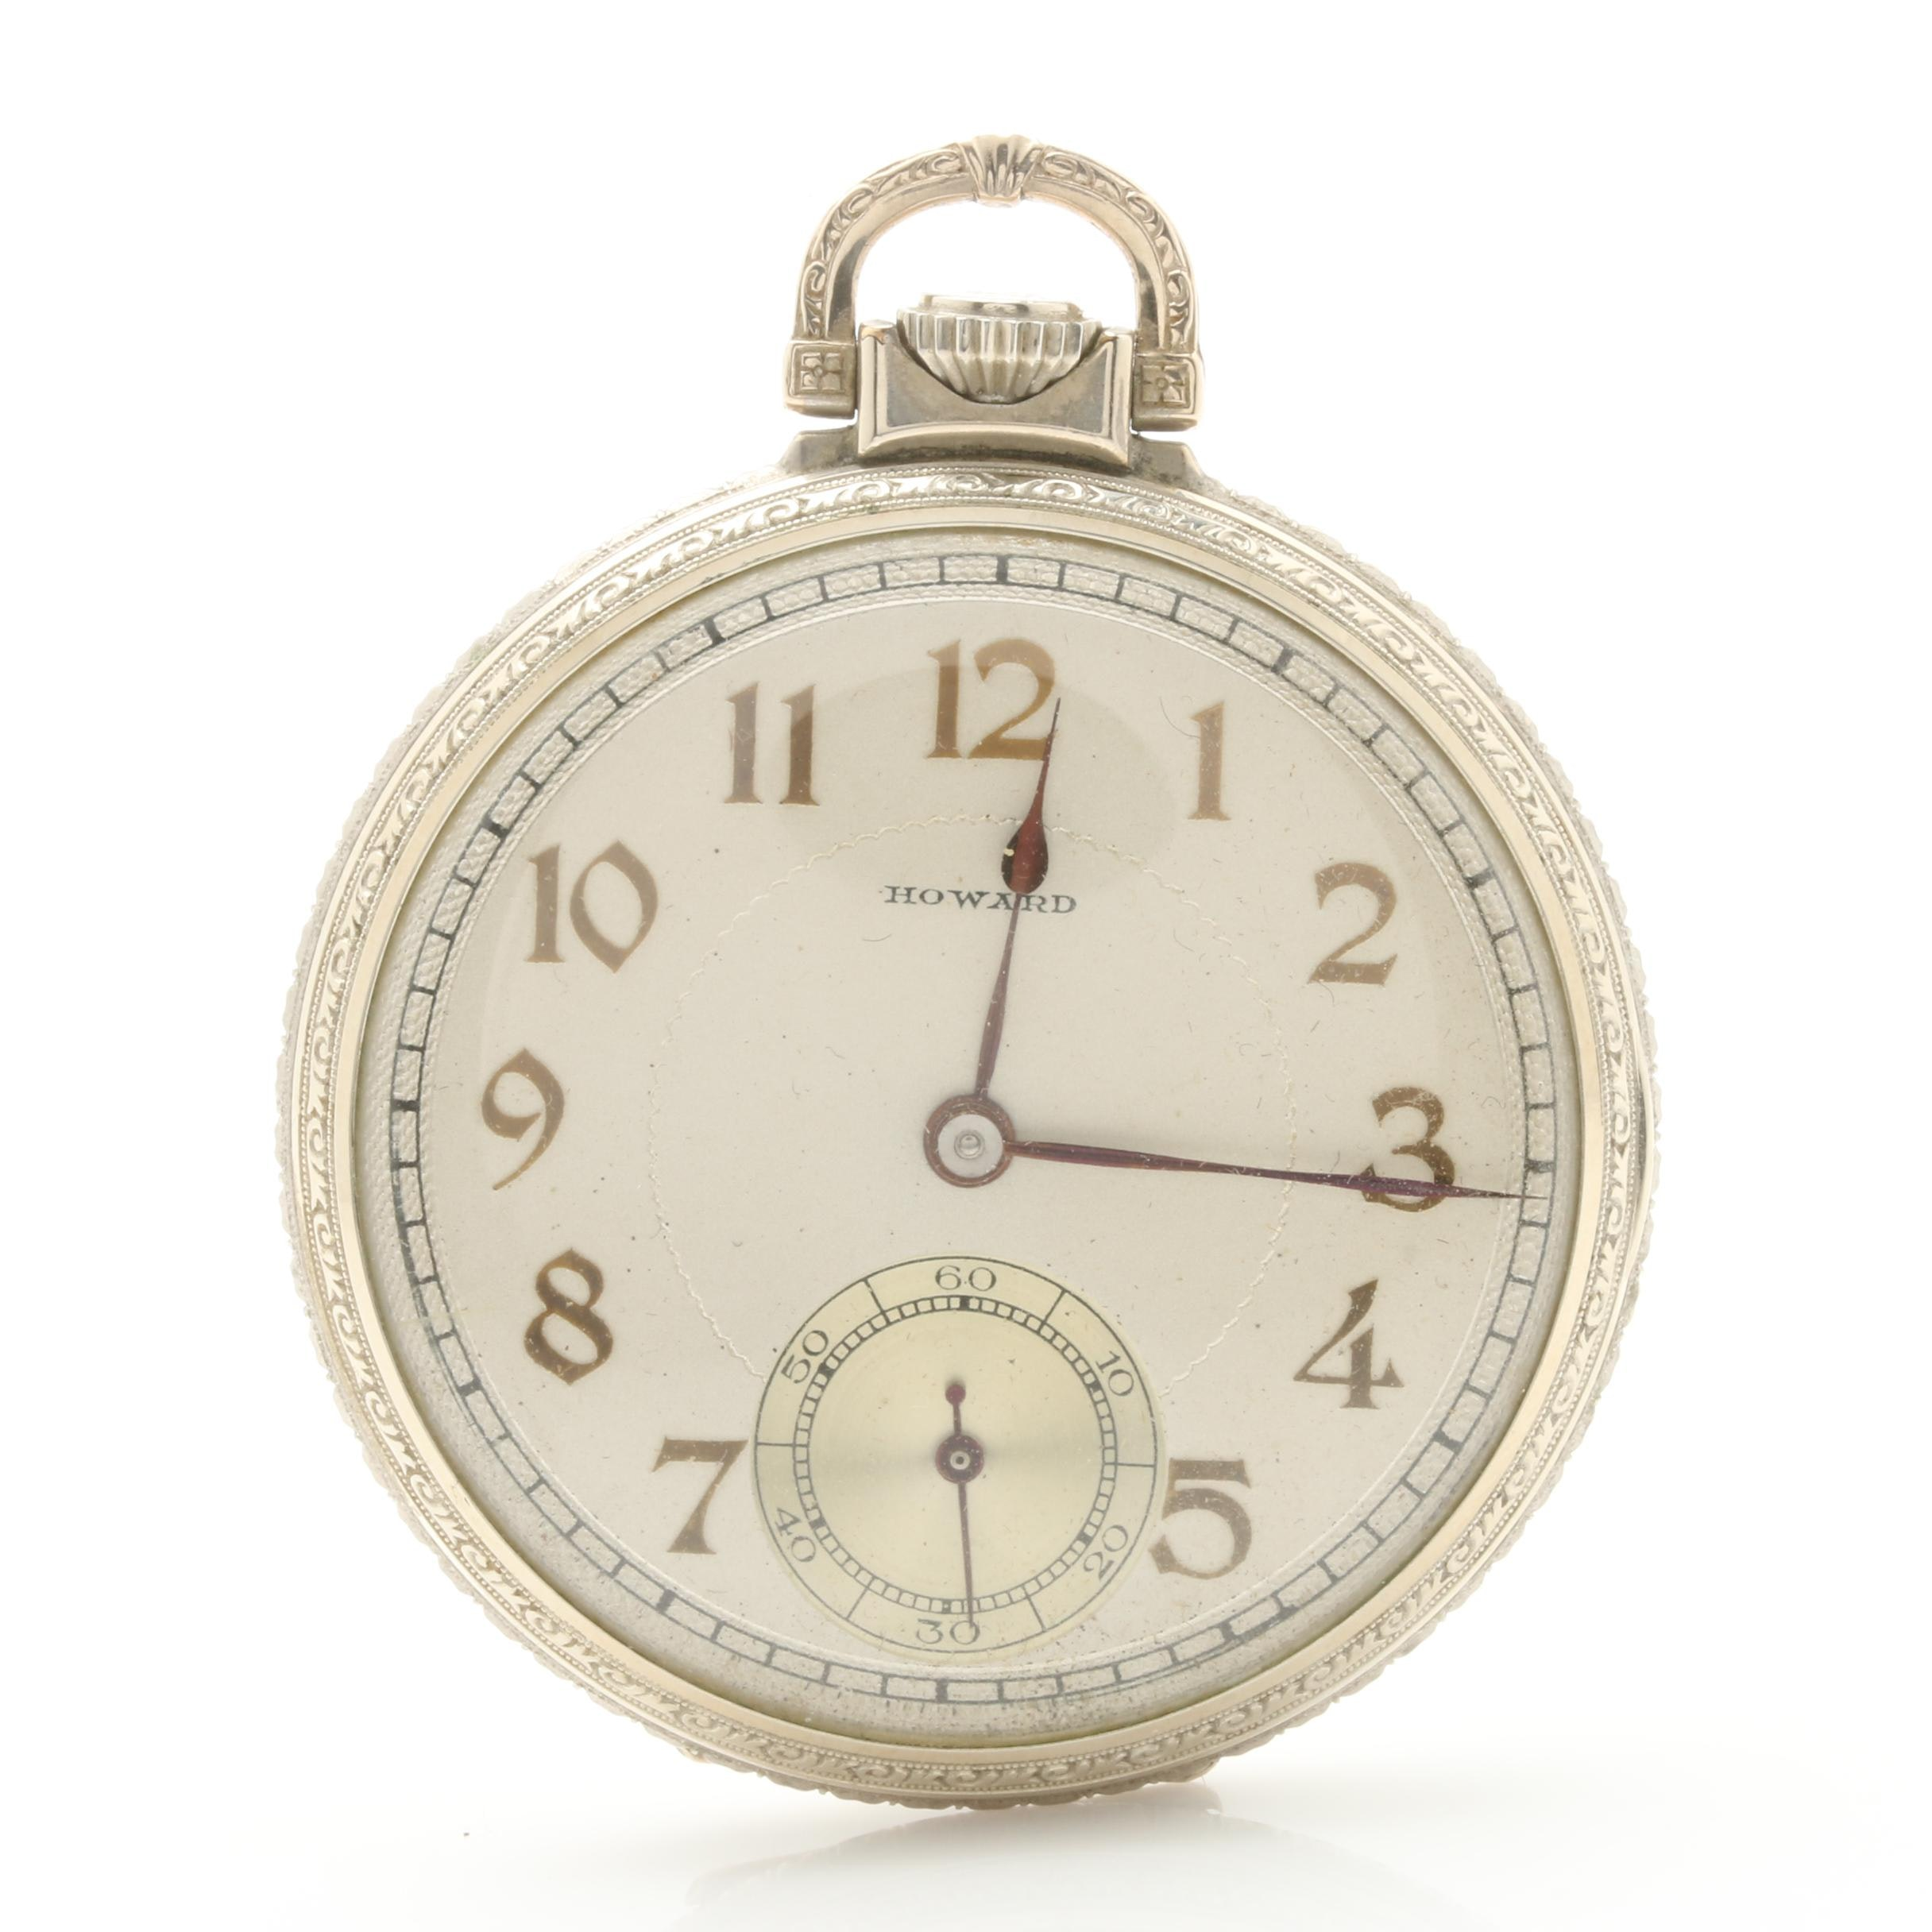 Antique Howard Open Face Pocket Watch